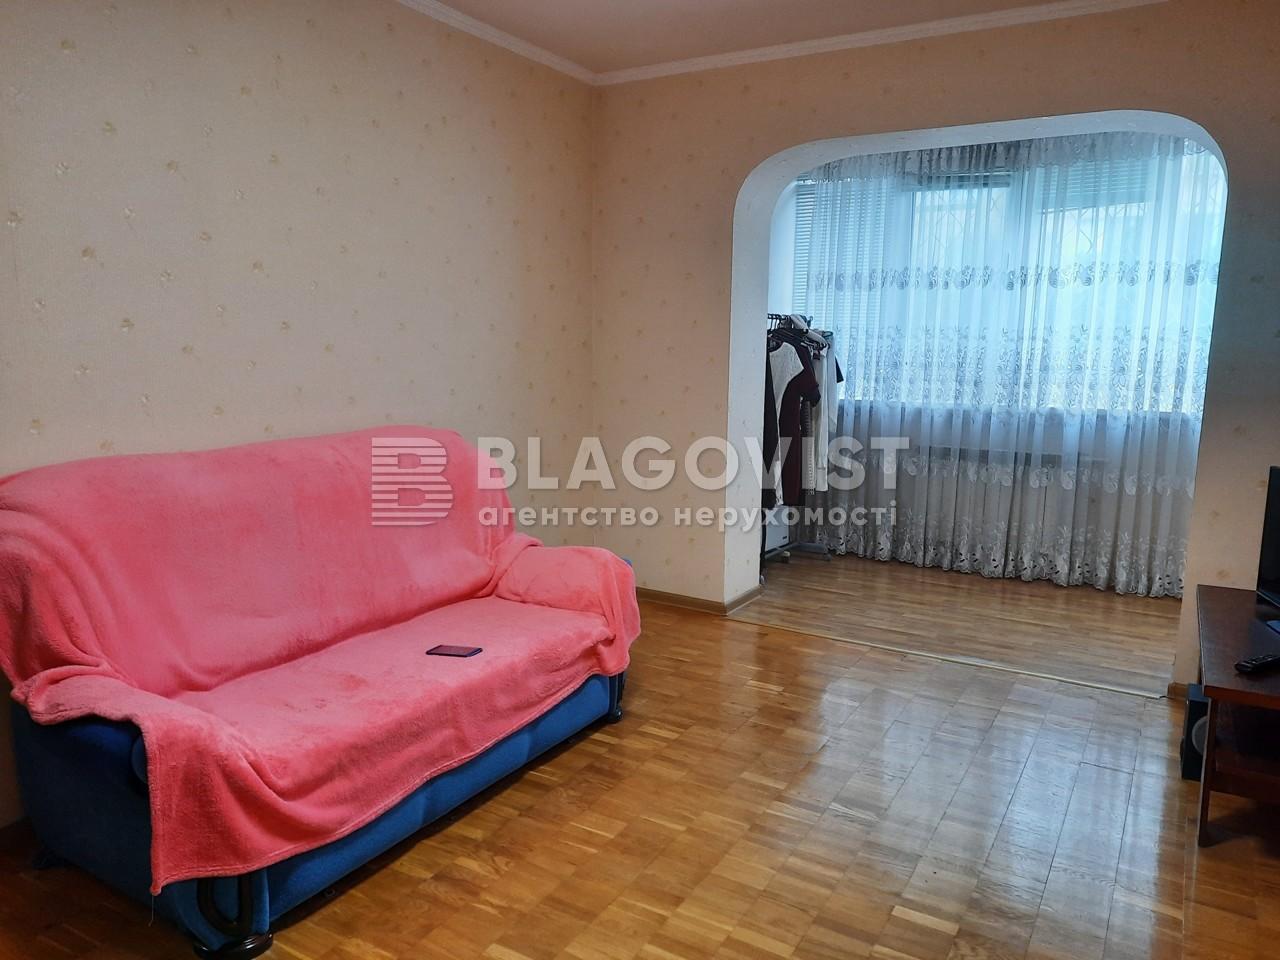 Квартира P-29771, Милославская, 31б, Киев - Фото 6